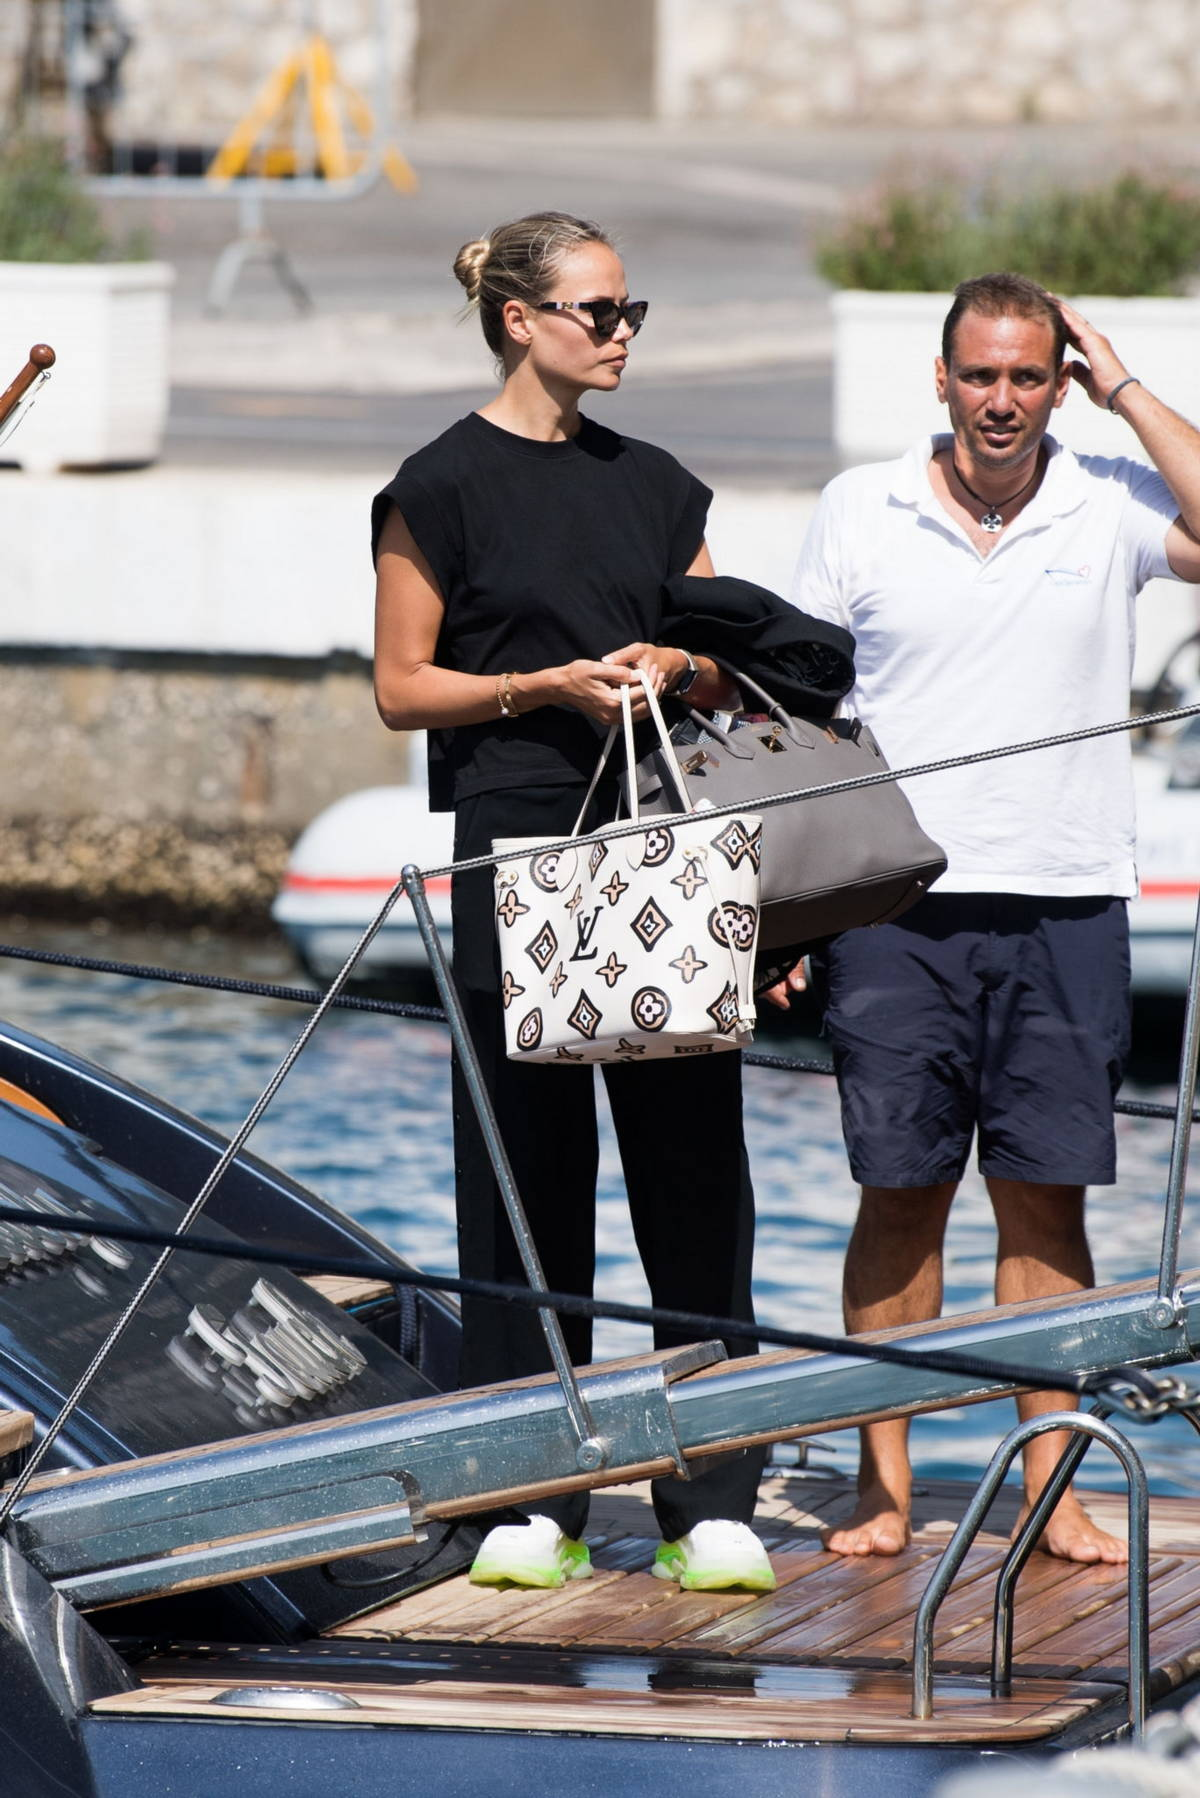 Natasha Poly seen arriving in Capri ahead of the UNICEF Italia and LuisaViaRoma Summer Gala in Capri, Italy